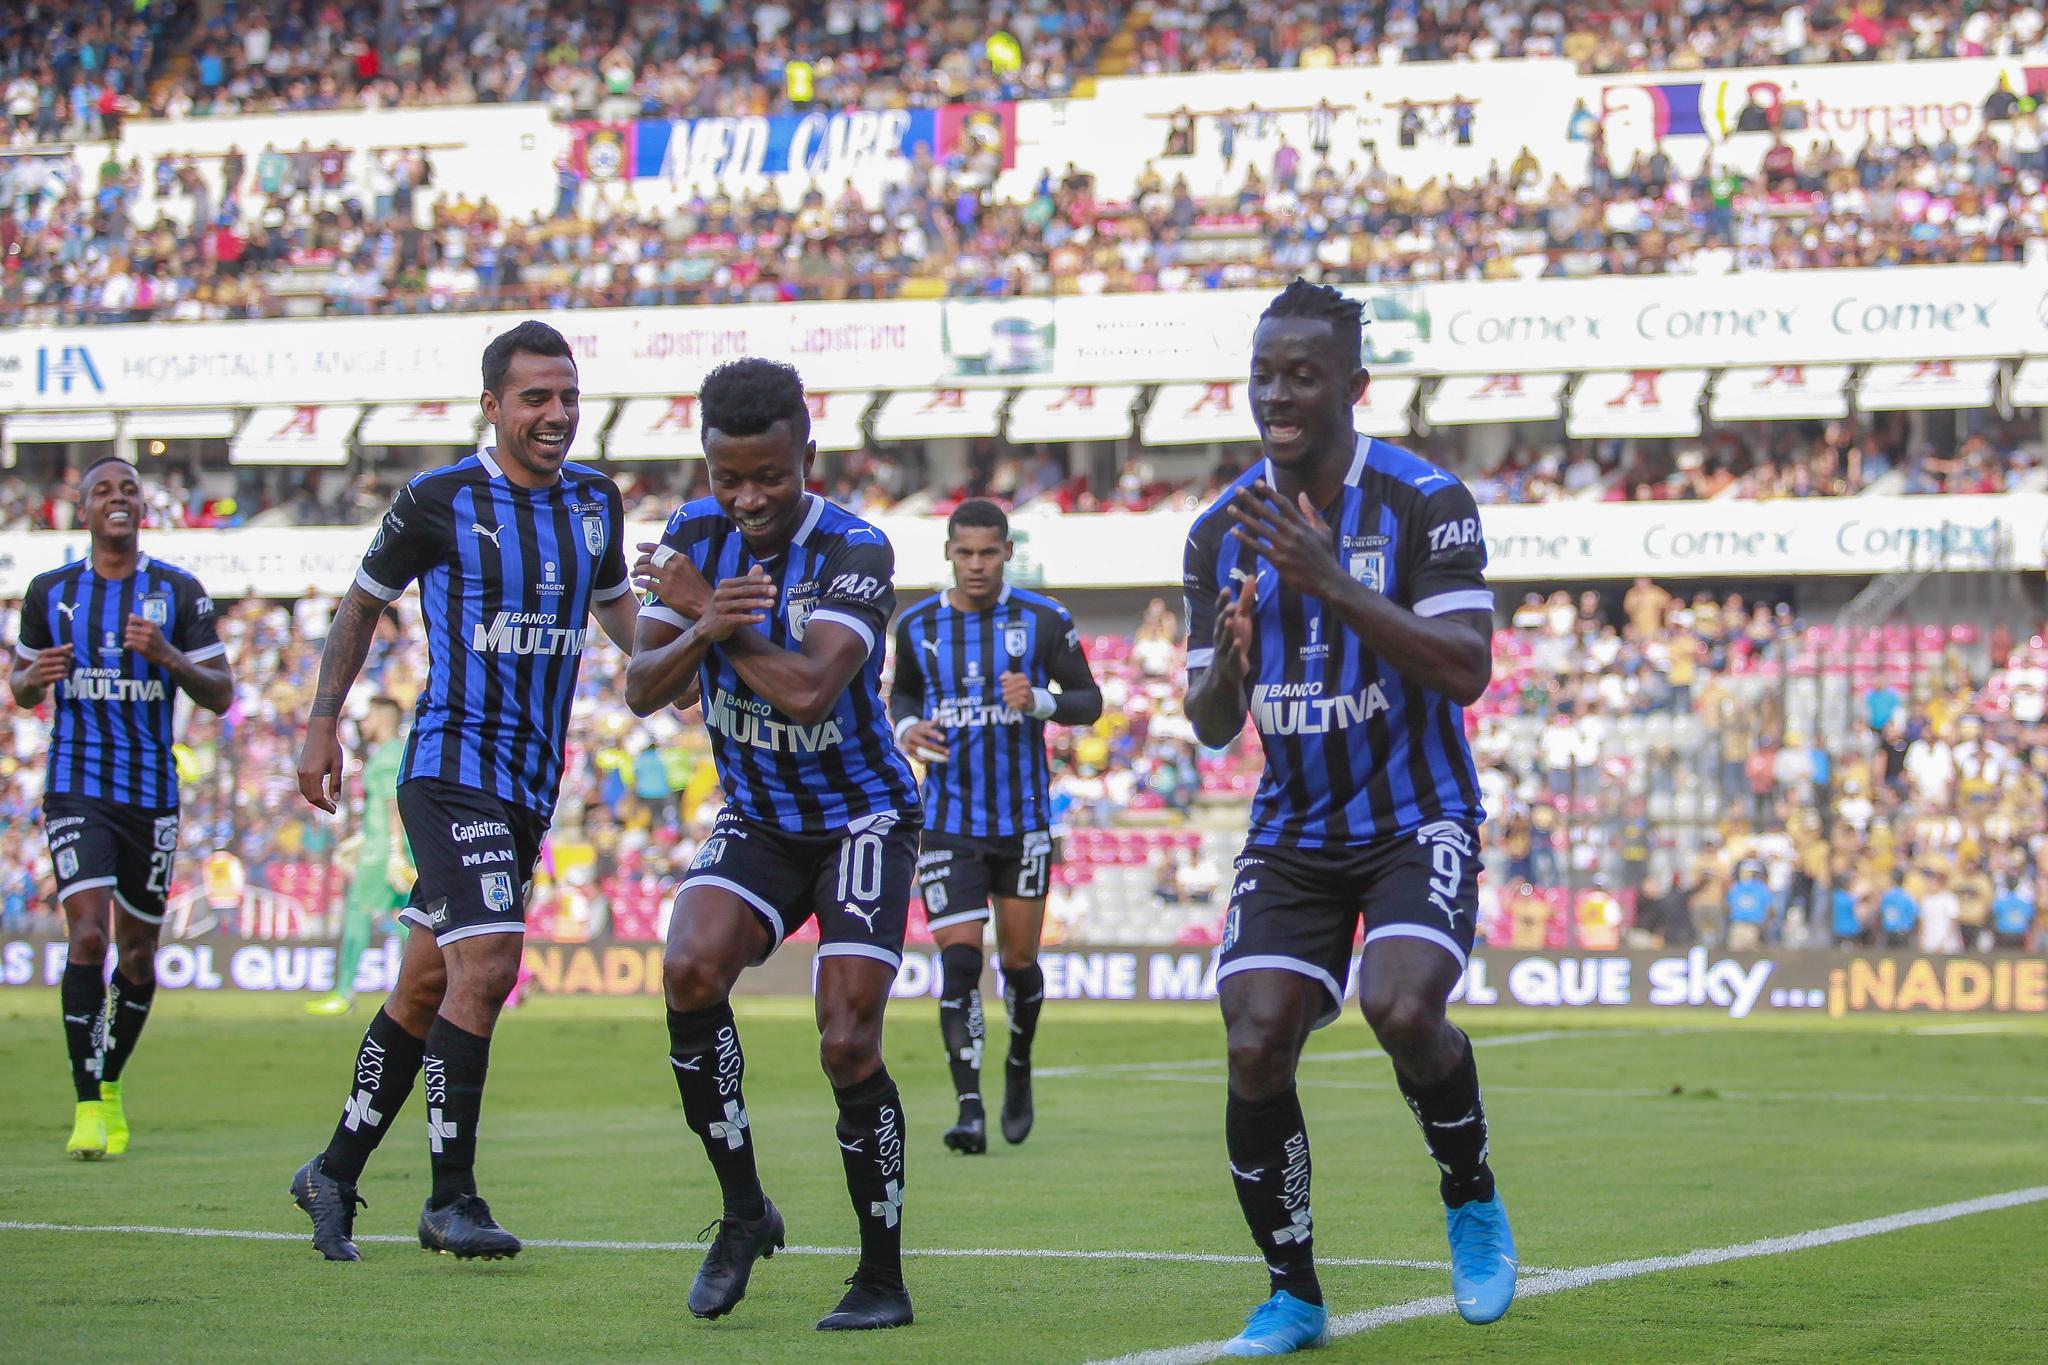 Calendario Liga MX: Canales para ver la jornada 16 del Apertura 2019